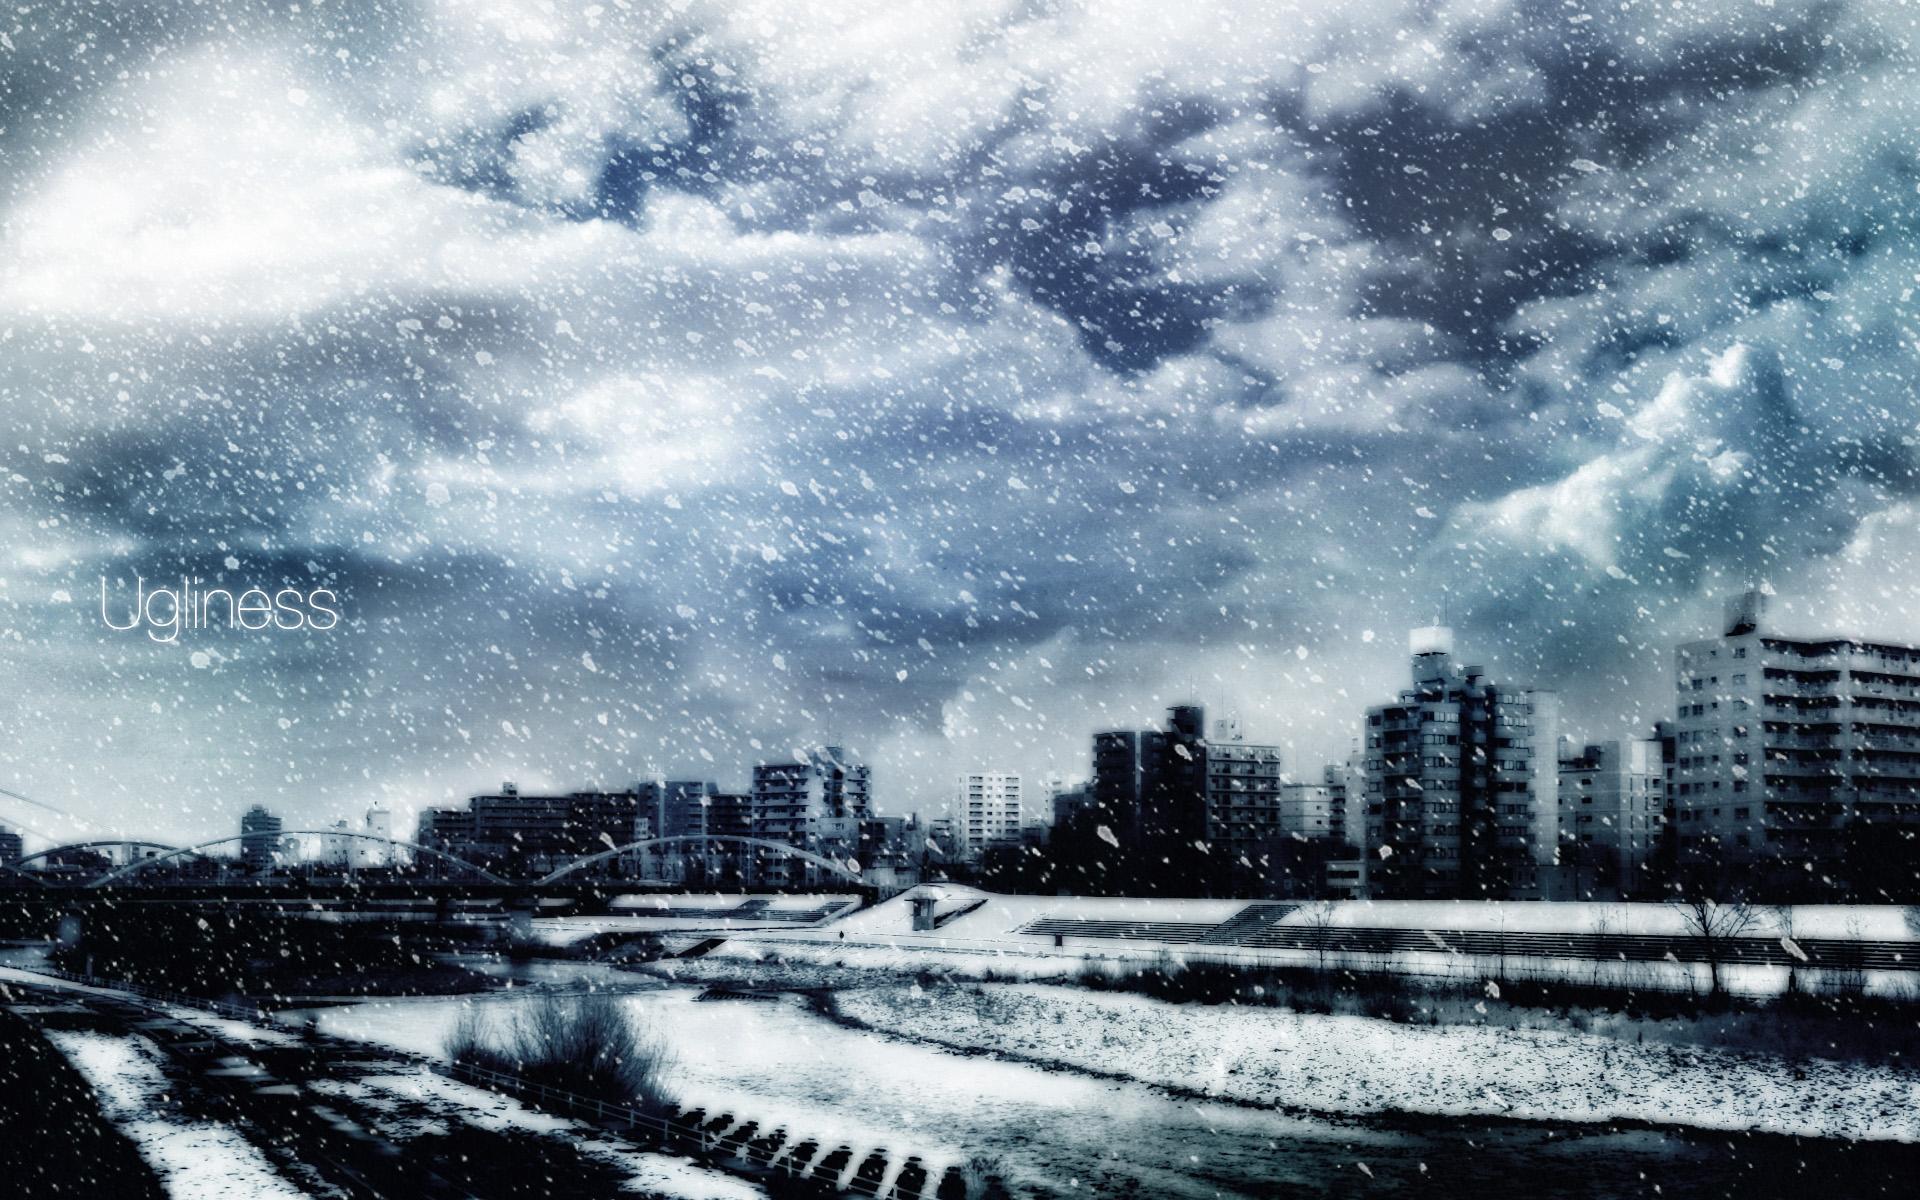 winter scenery iphone wallpaper